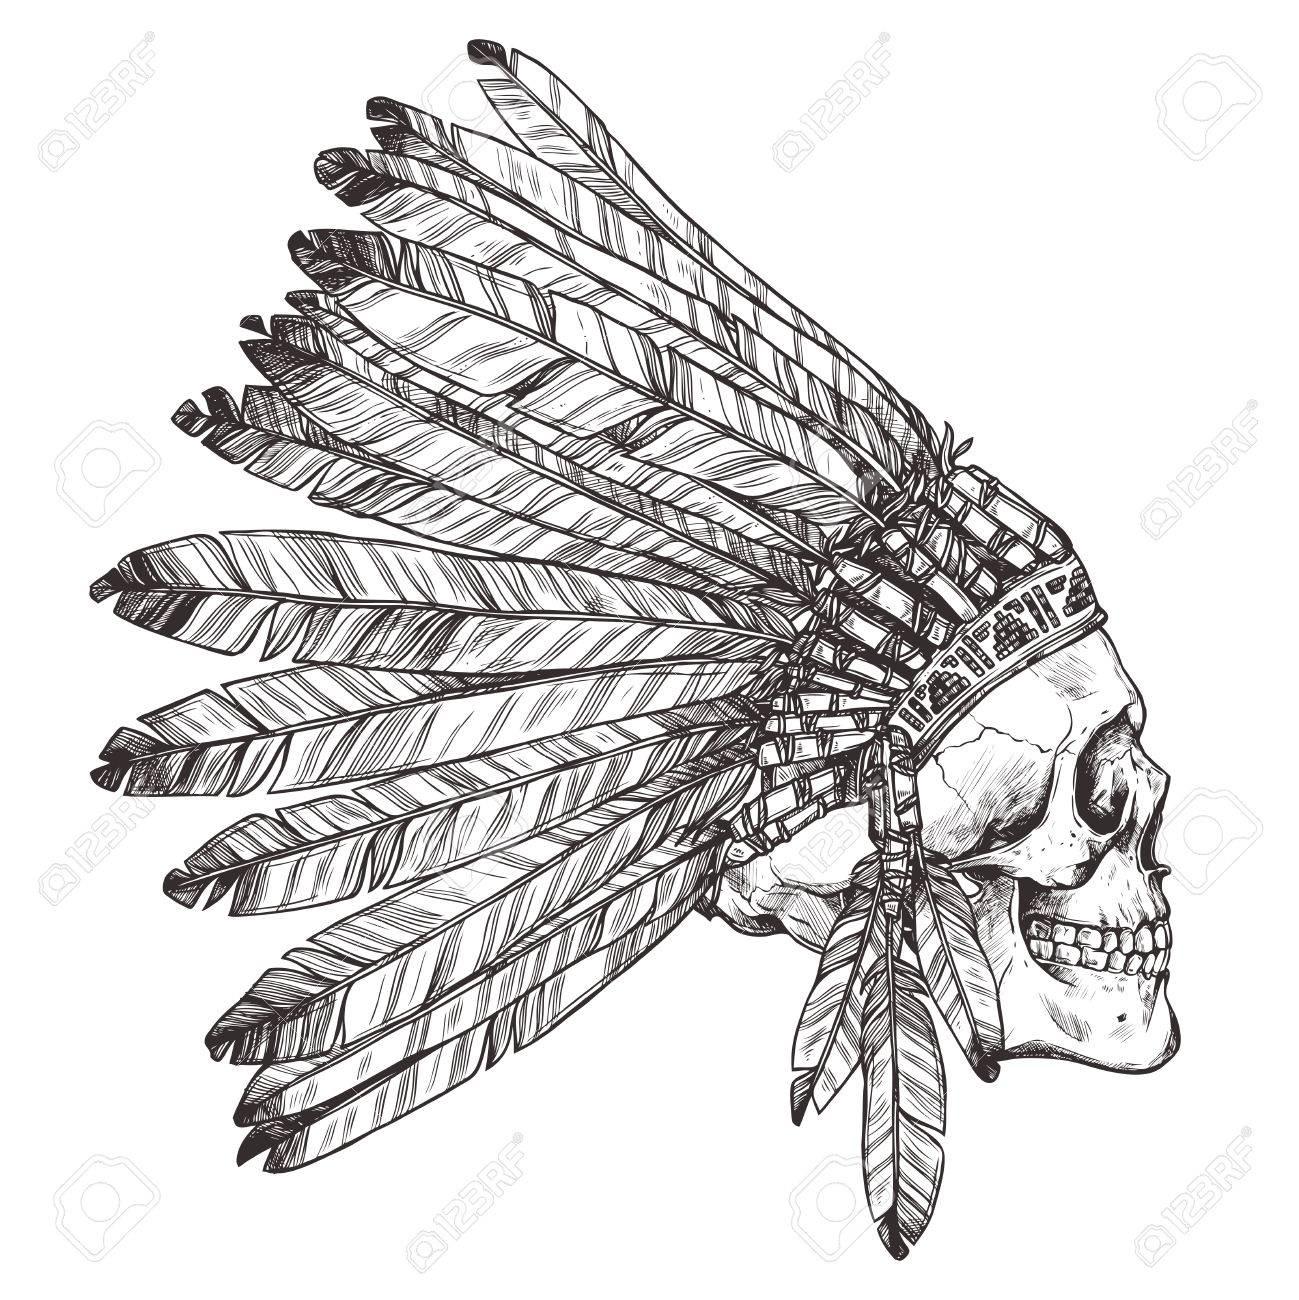 1299x1300 Indian Headdress Drawing Indian Headdress Drawing Tumblr